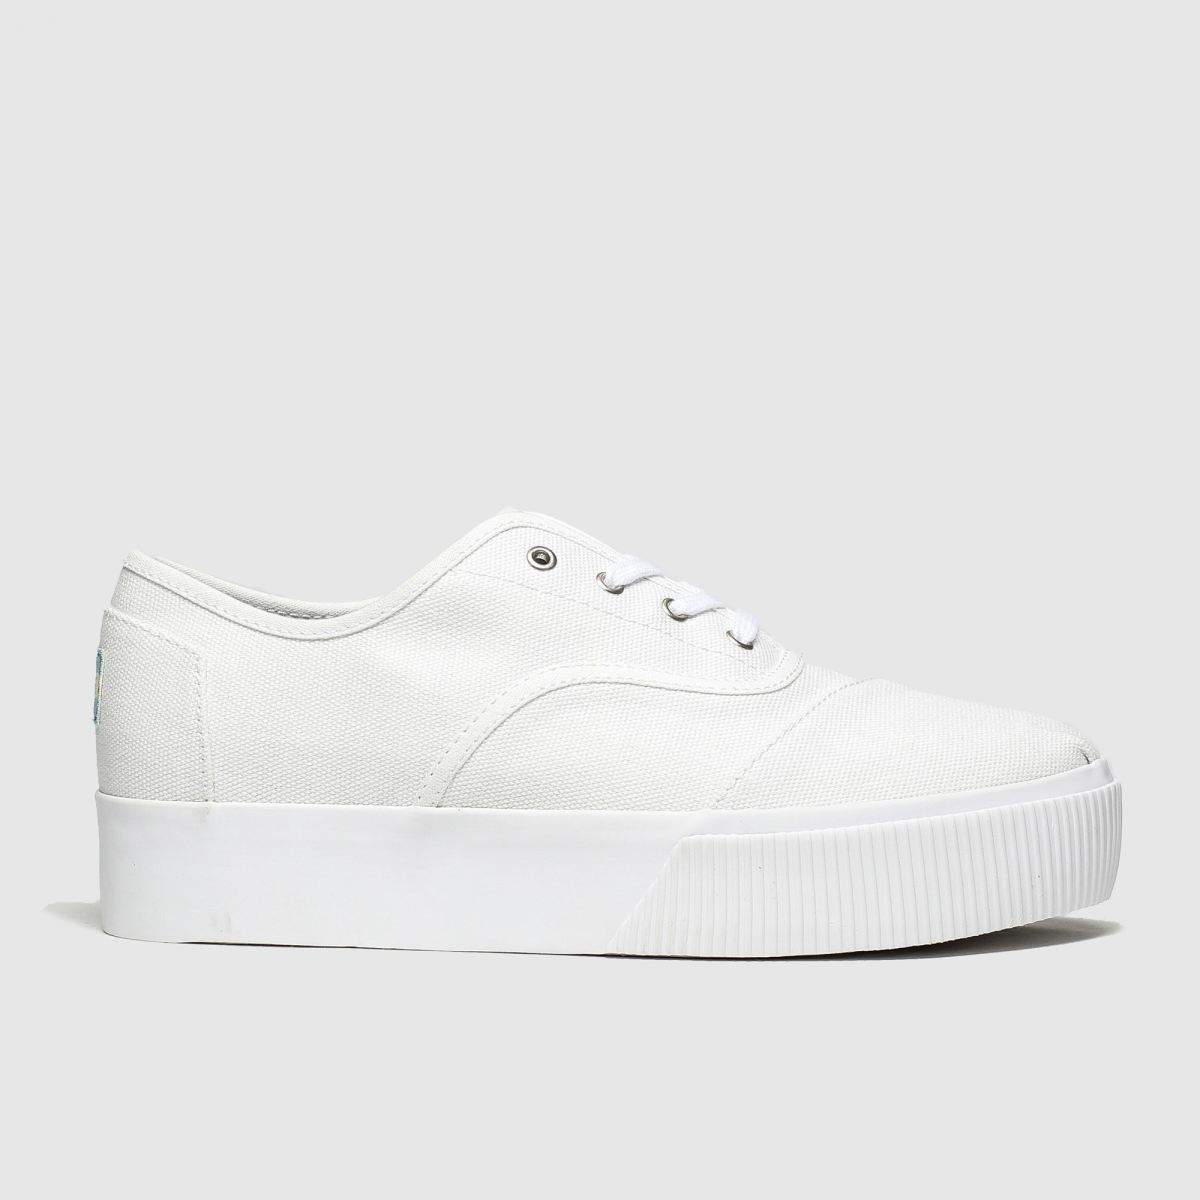 Toms White Cordones Platform Vegan Flat Shoes